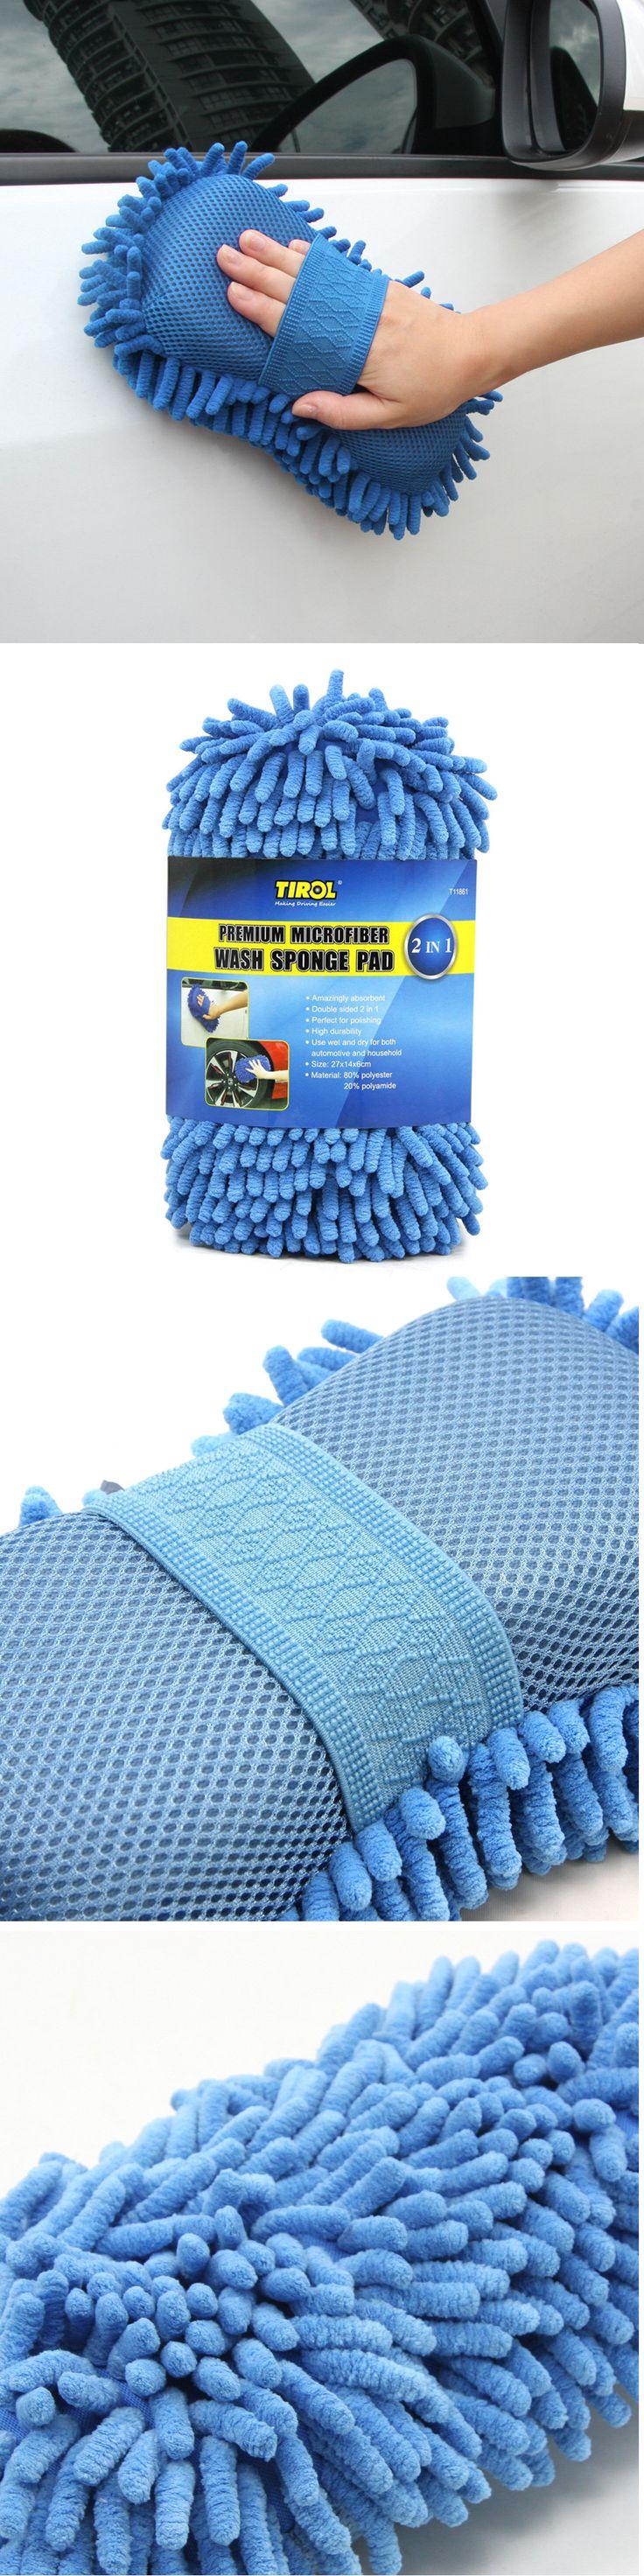 US$5.99 Car Coralline Sponge Microfiber Washer Clean Wash Towel Cleaning Duster